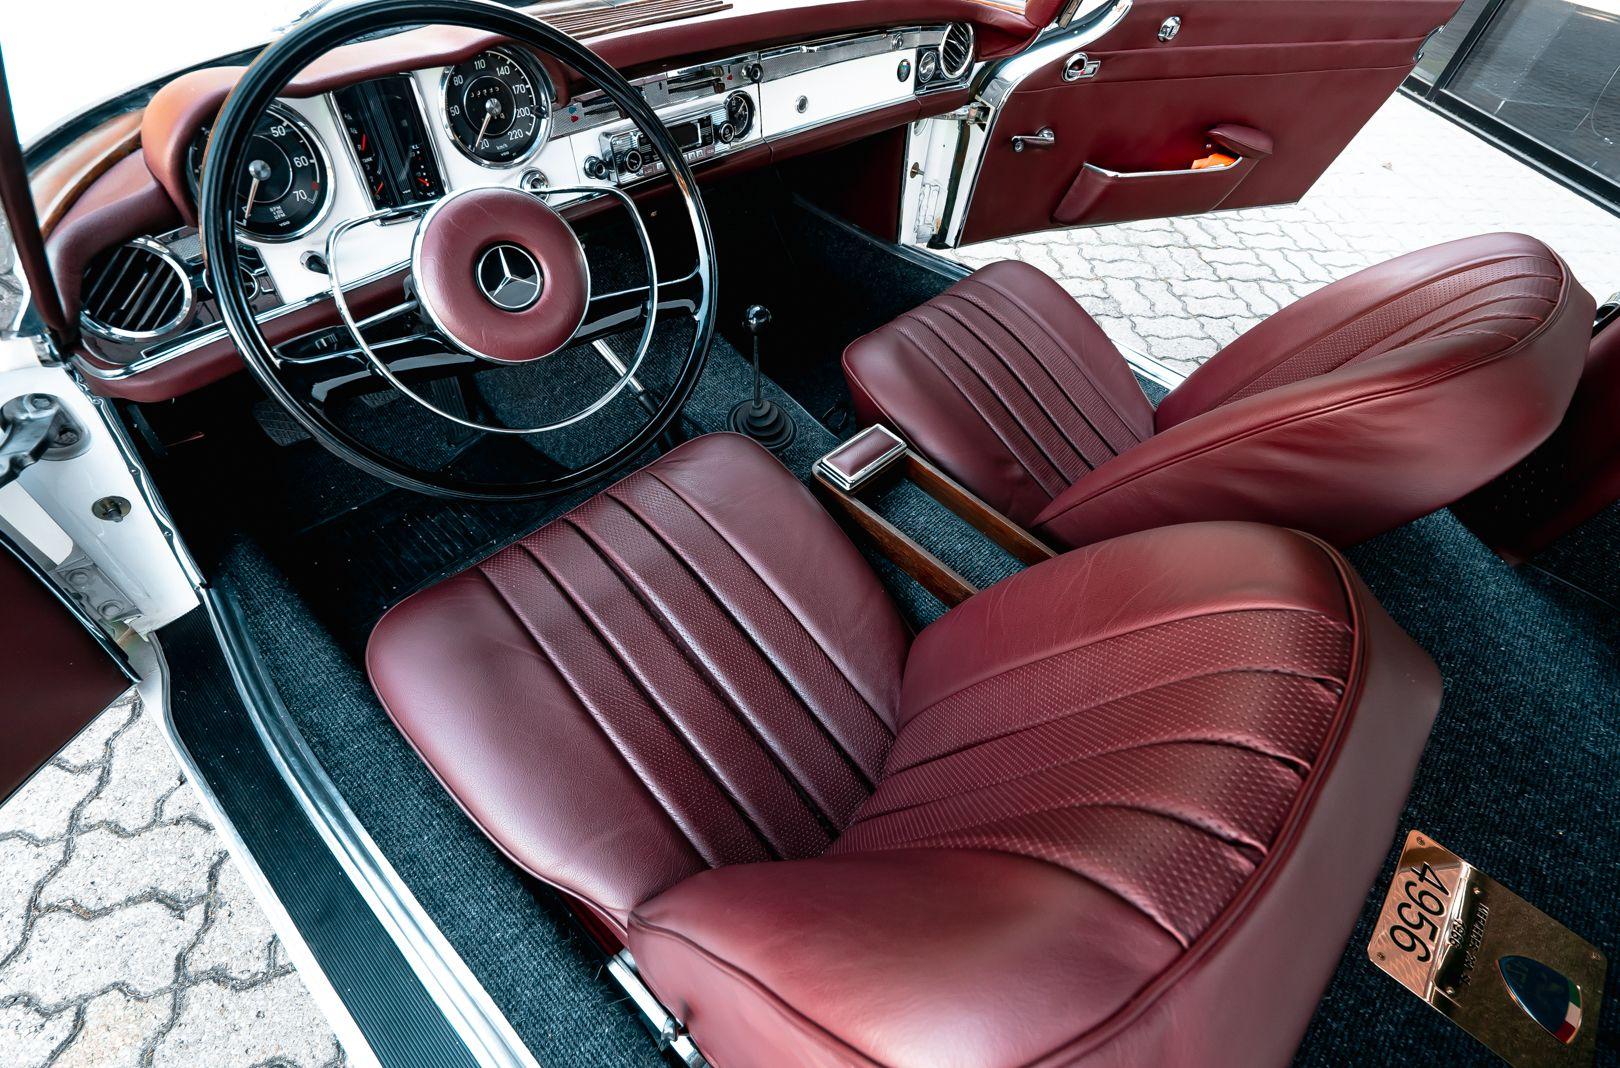 1966 Mercedes Benz SL230 Pagoda 75869